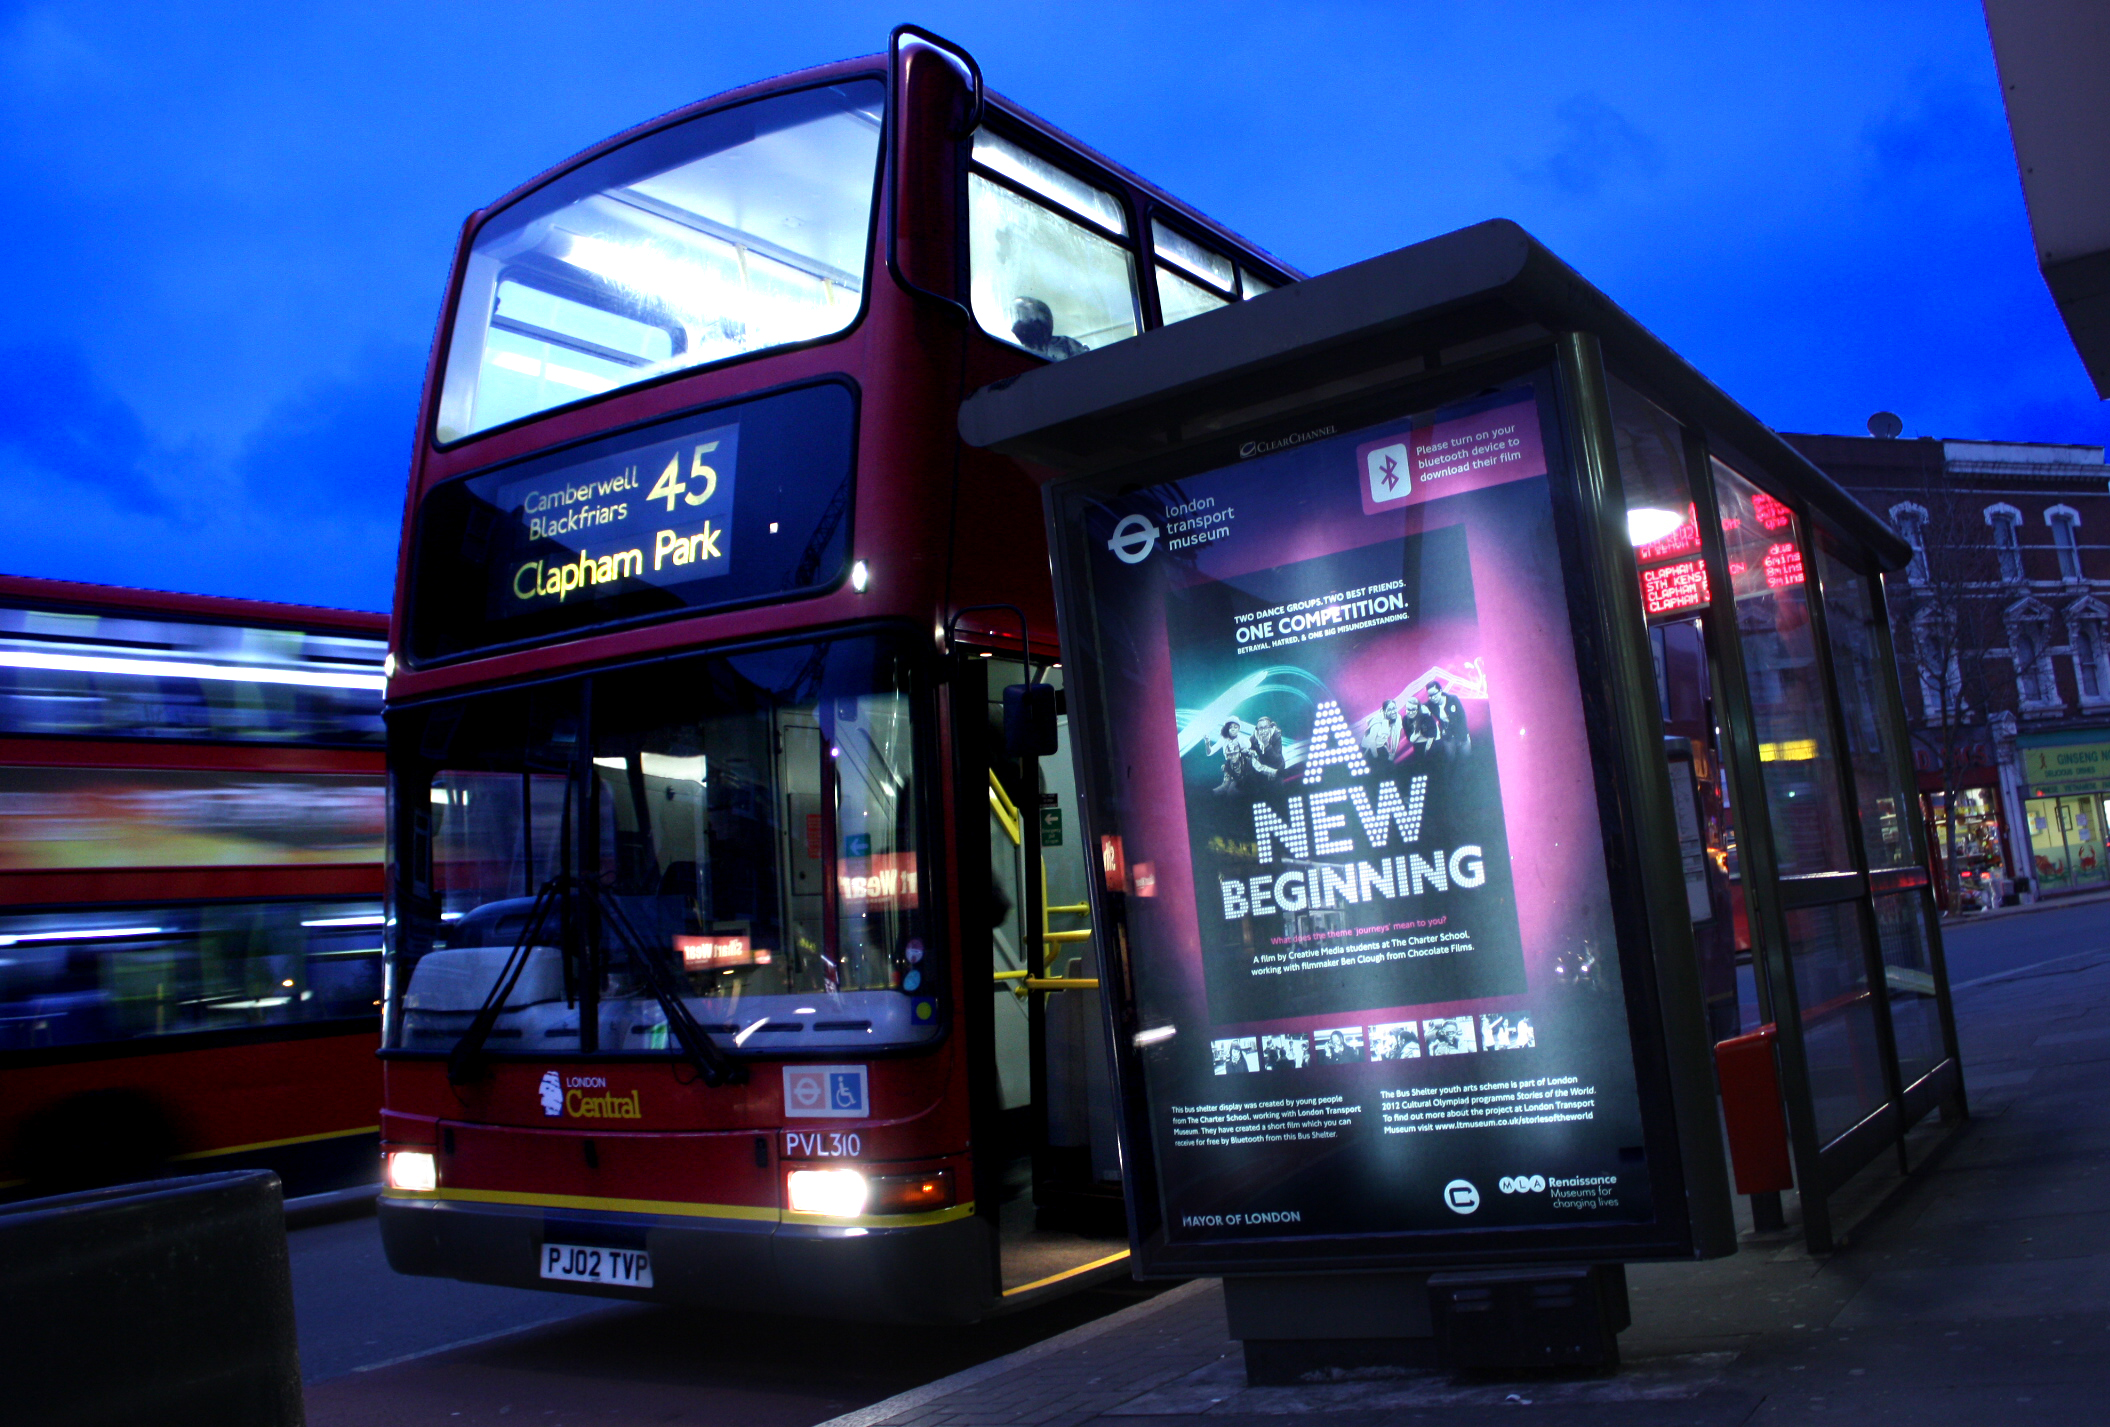 Digital signage on Bus shelters